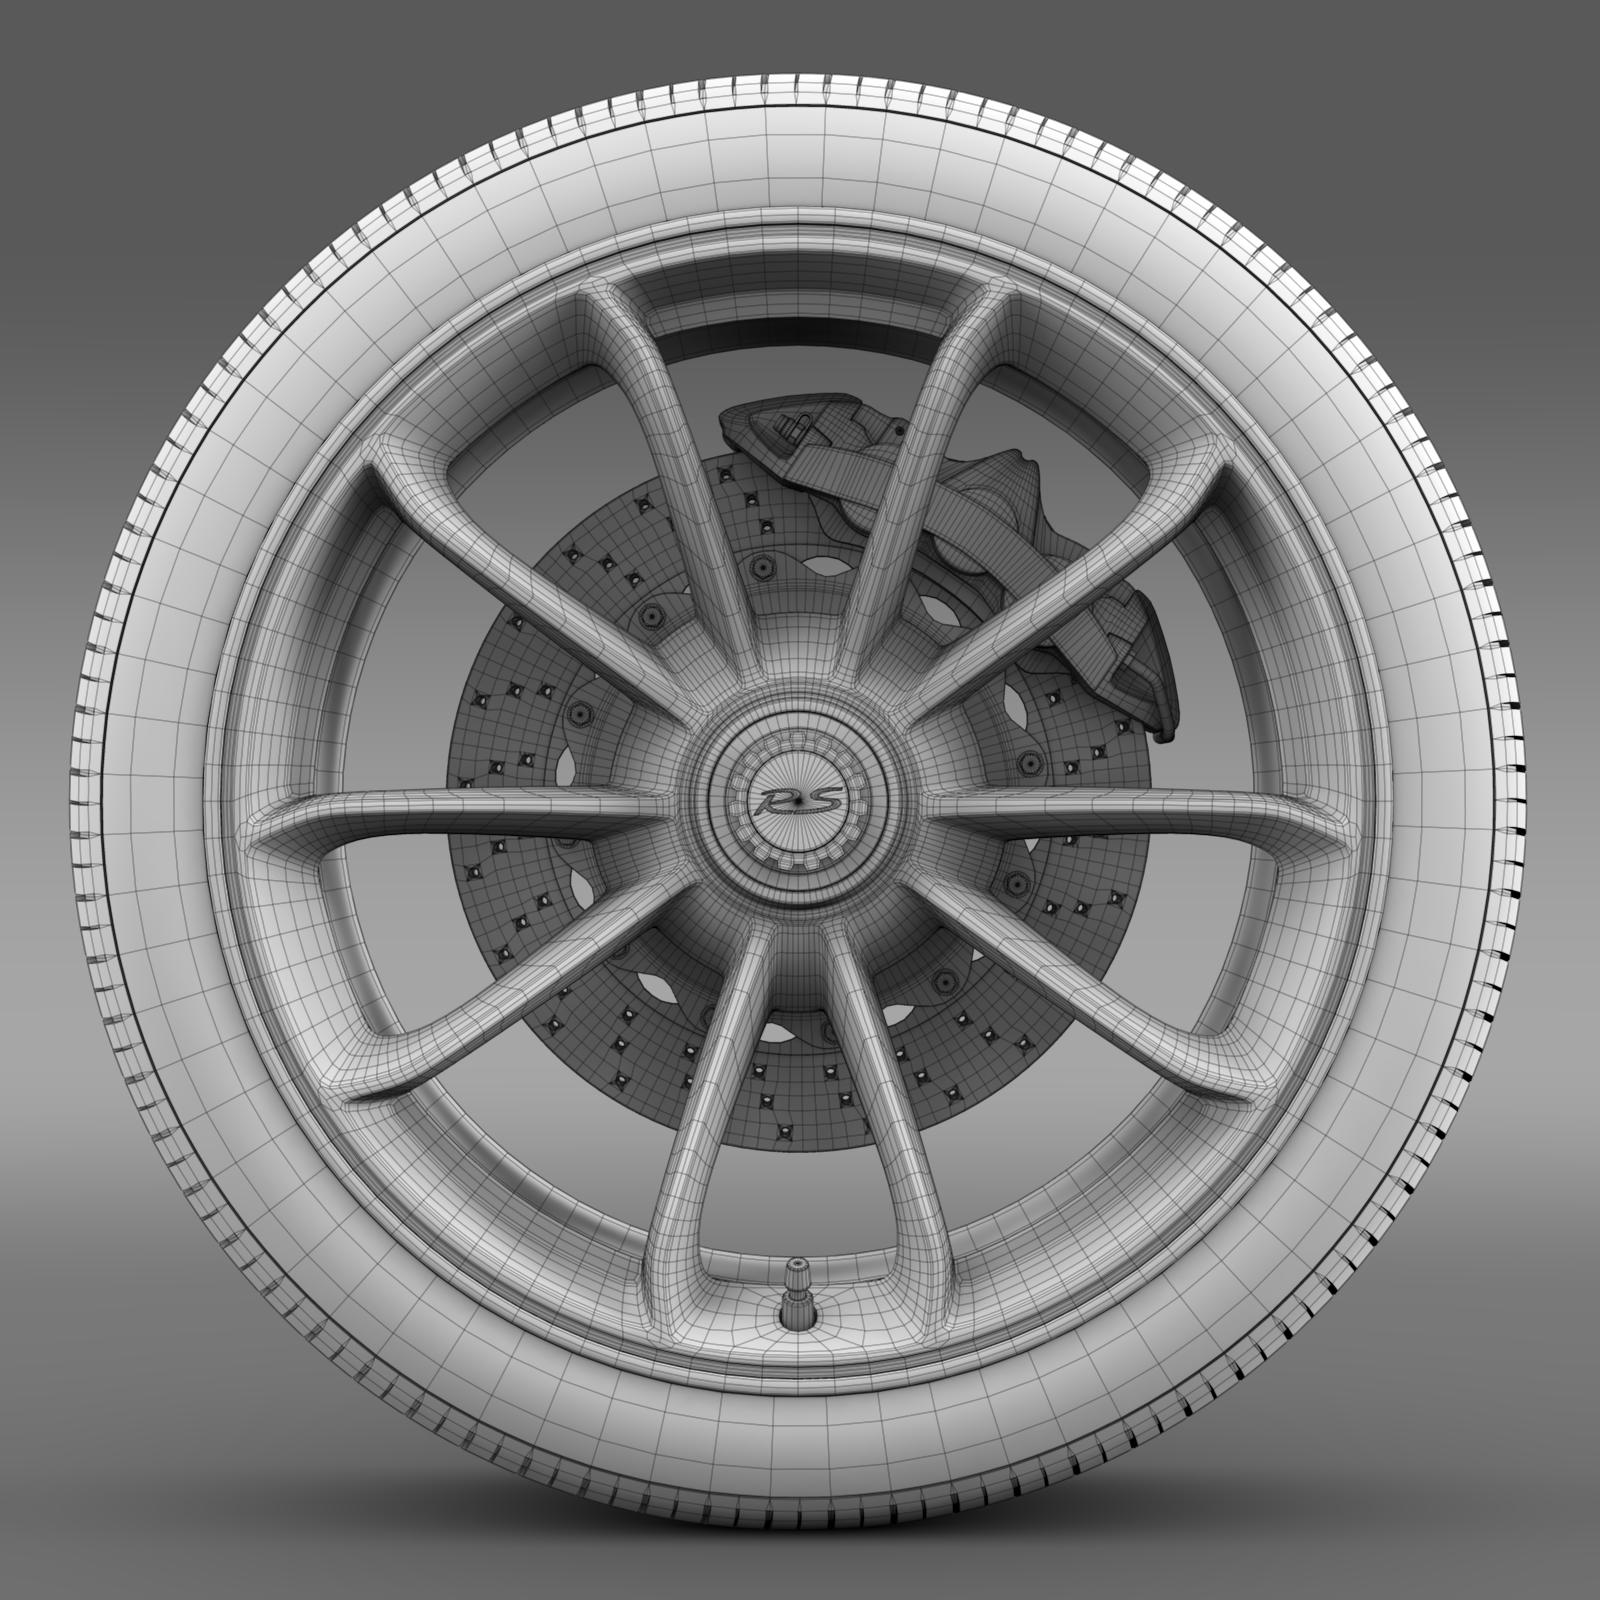 porsche 911 gt3 rs 2015 wheel 3d model 3ds max fbx c4d lwo ma mb hrc xsi obj 210837